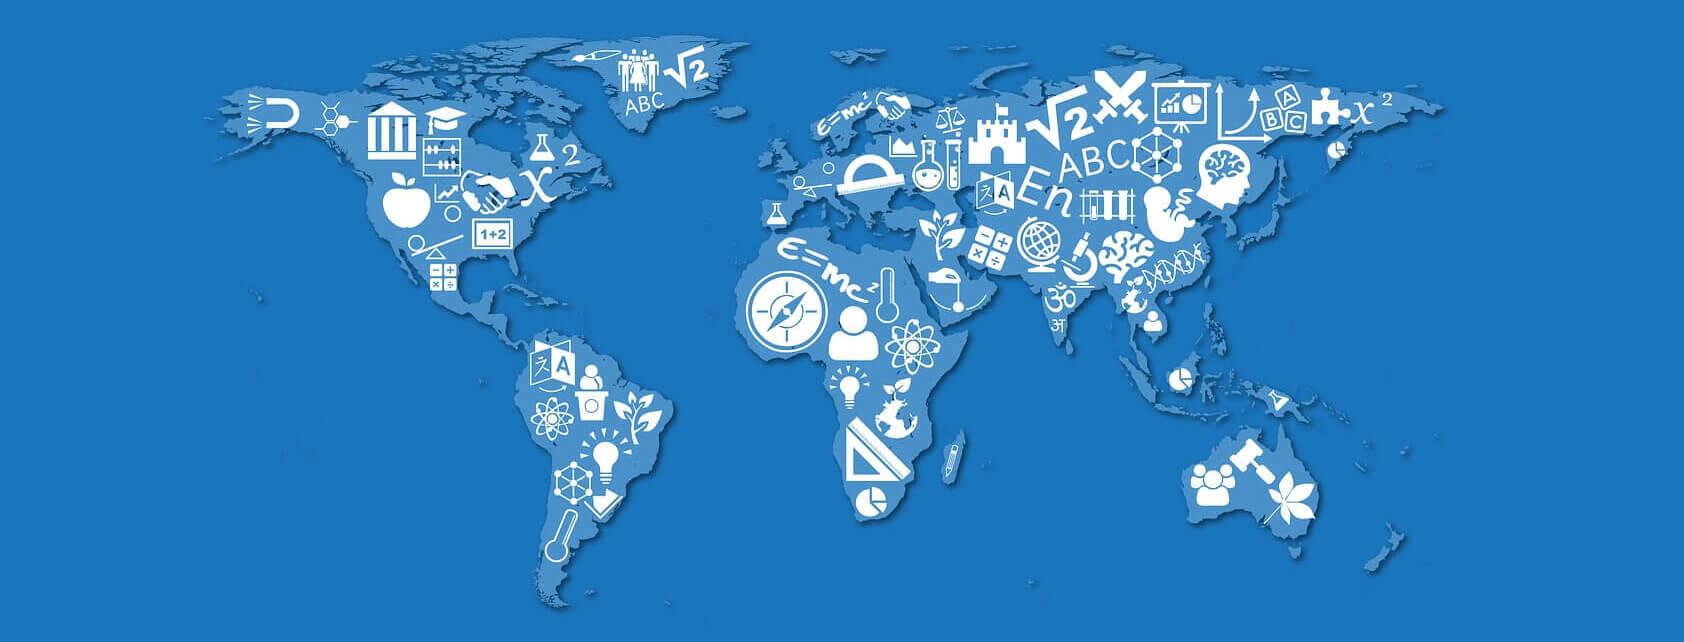 CGR International School Global Education